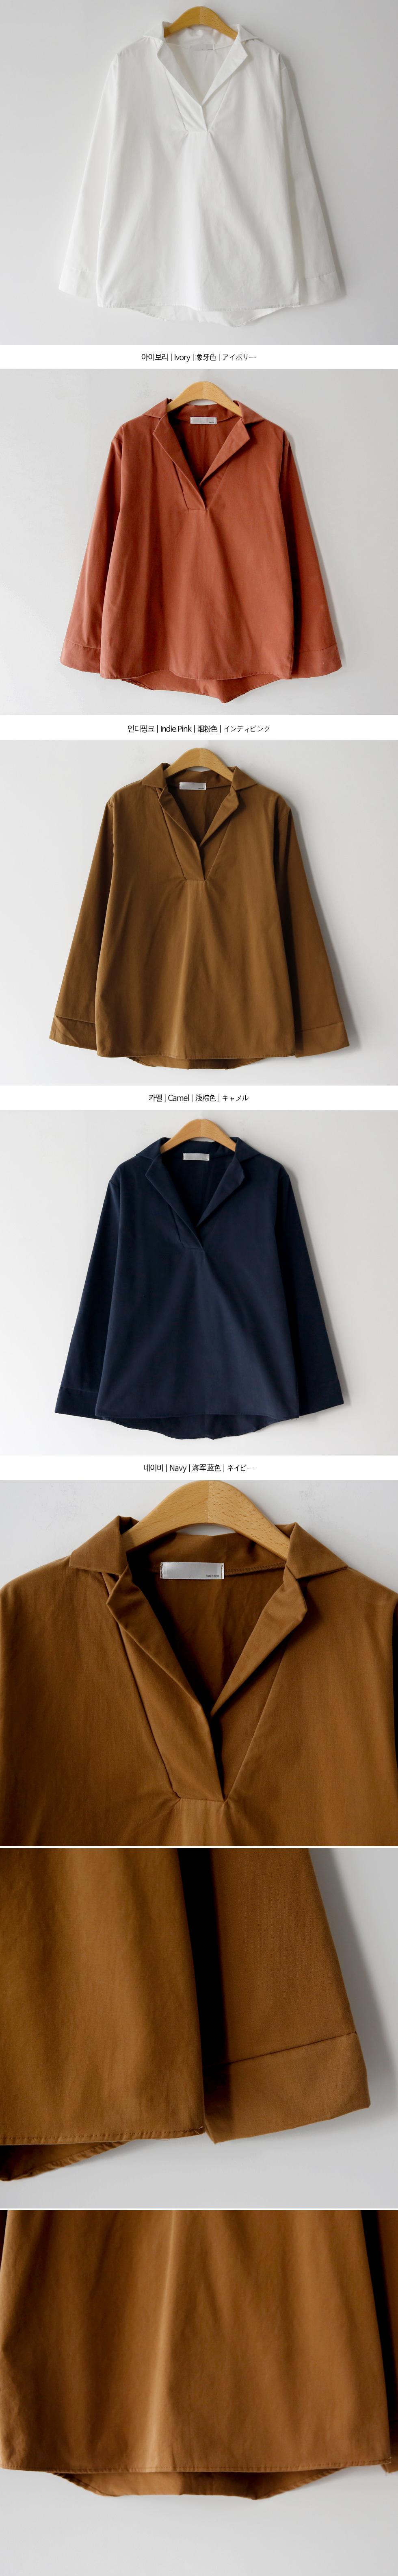 Pitch semi-open shirt